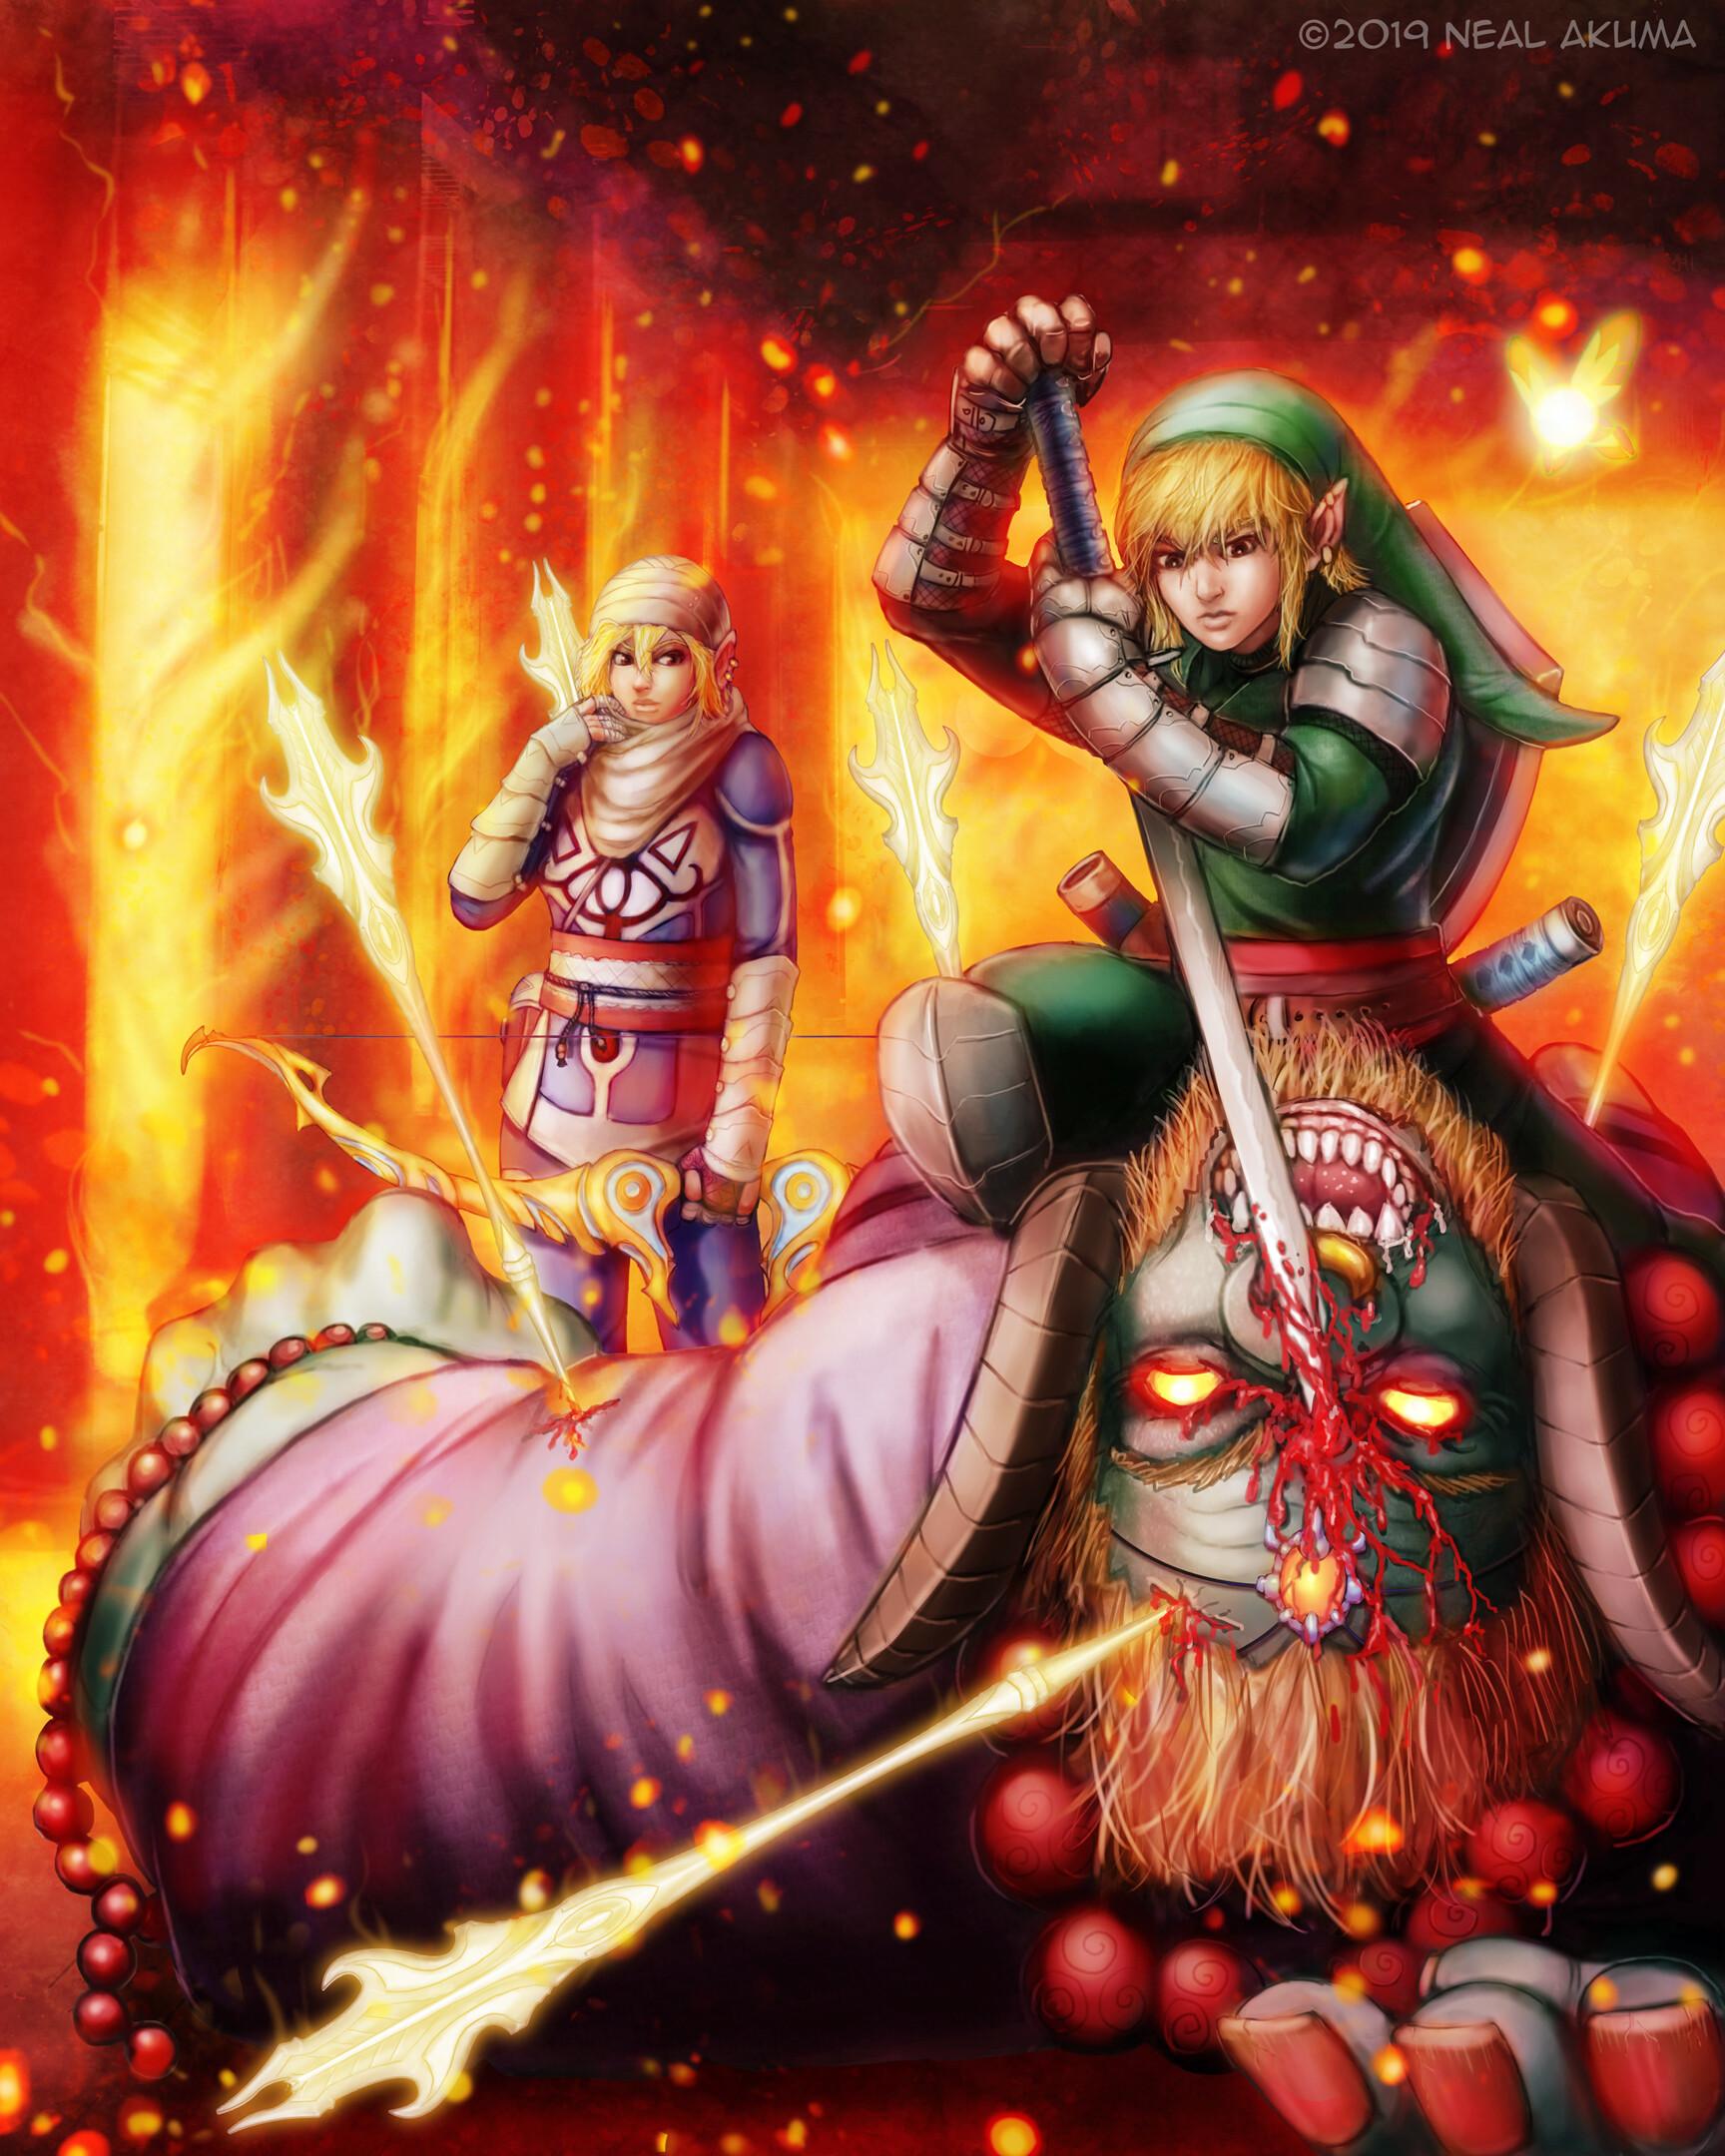 Neal Akuma Zelda Link Vs Ganon 3